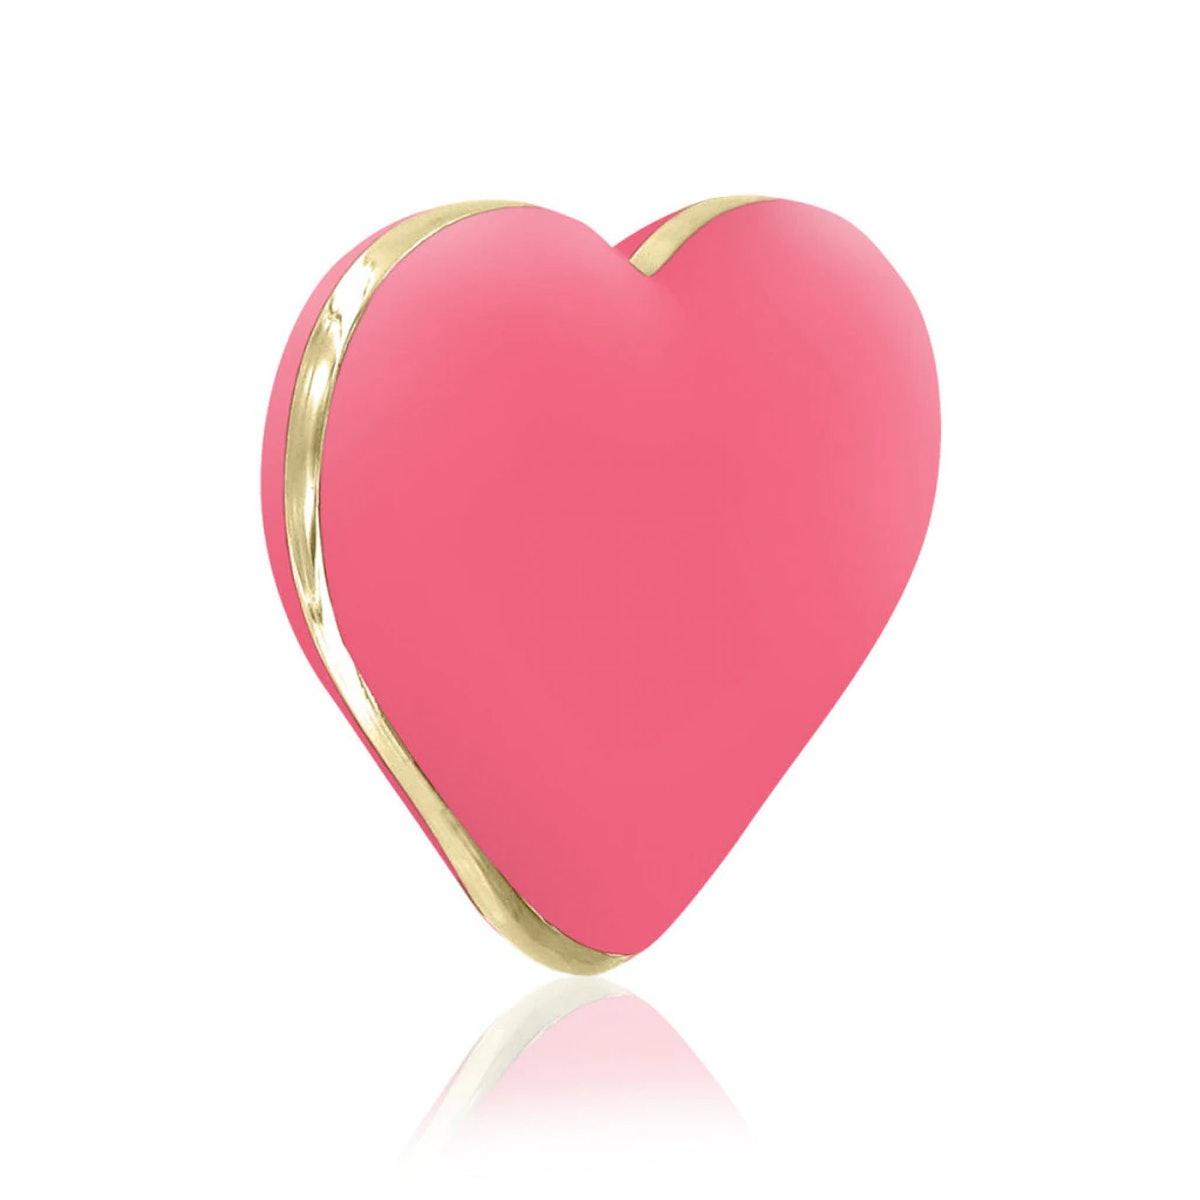 Rianne S Heart Vibe